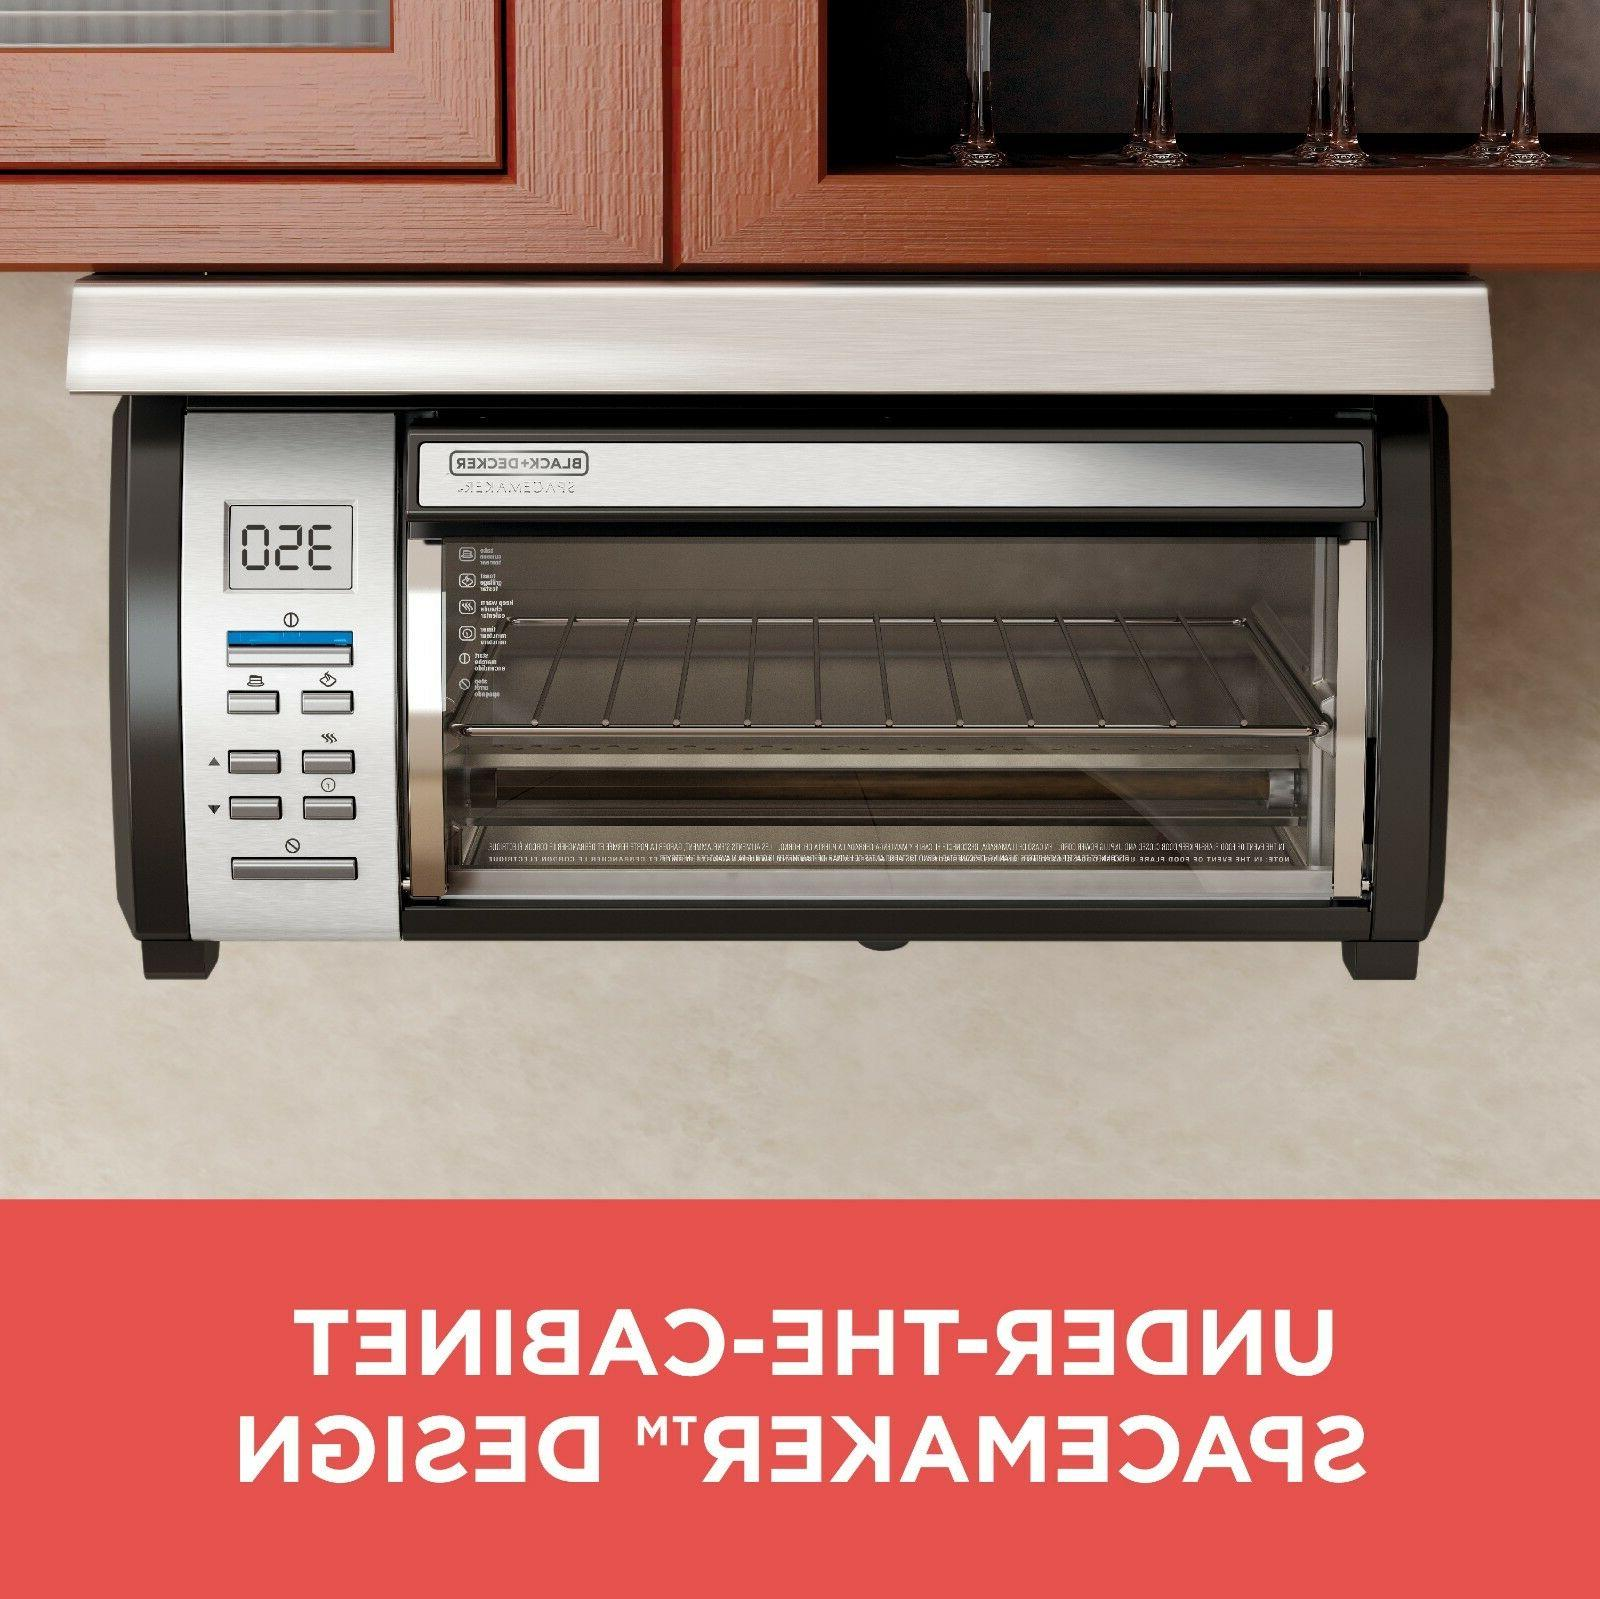 space maker under counter toaster oven digital